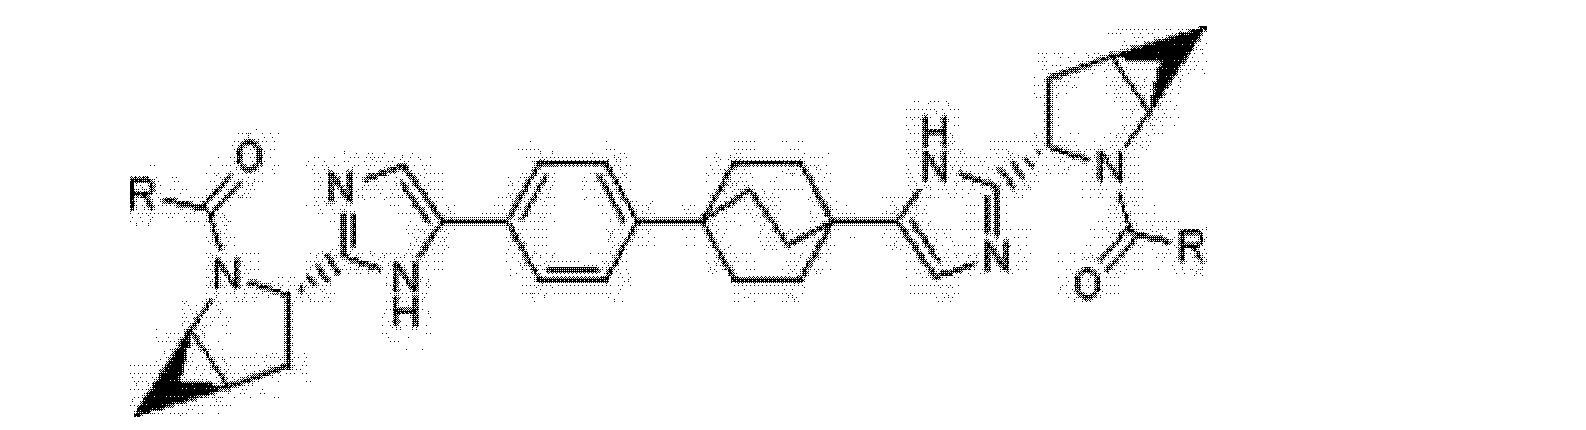 Figure CN102378762AD01441